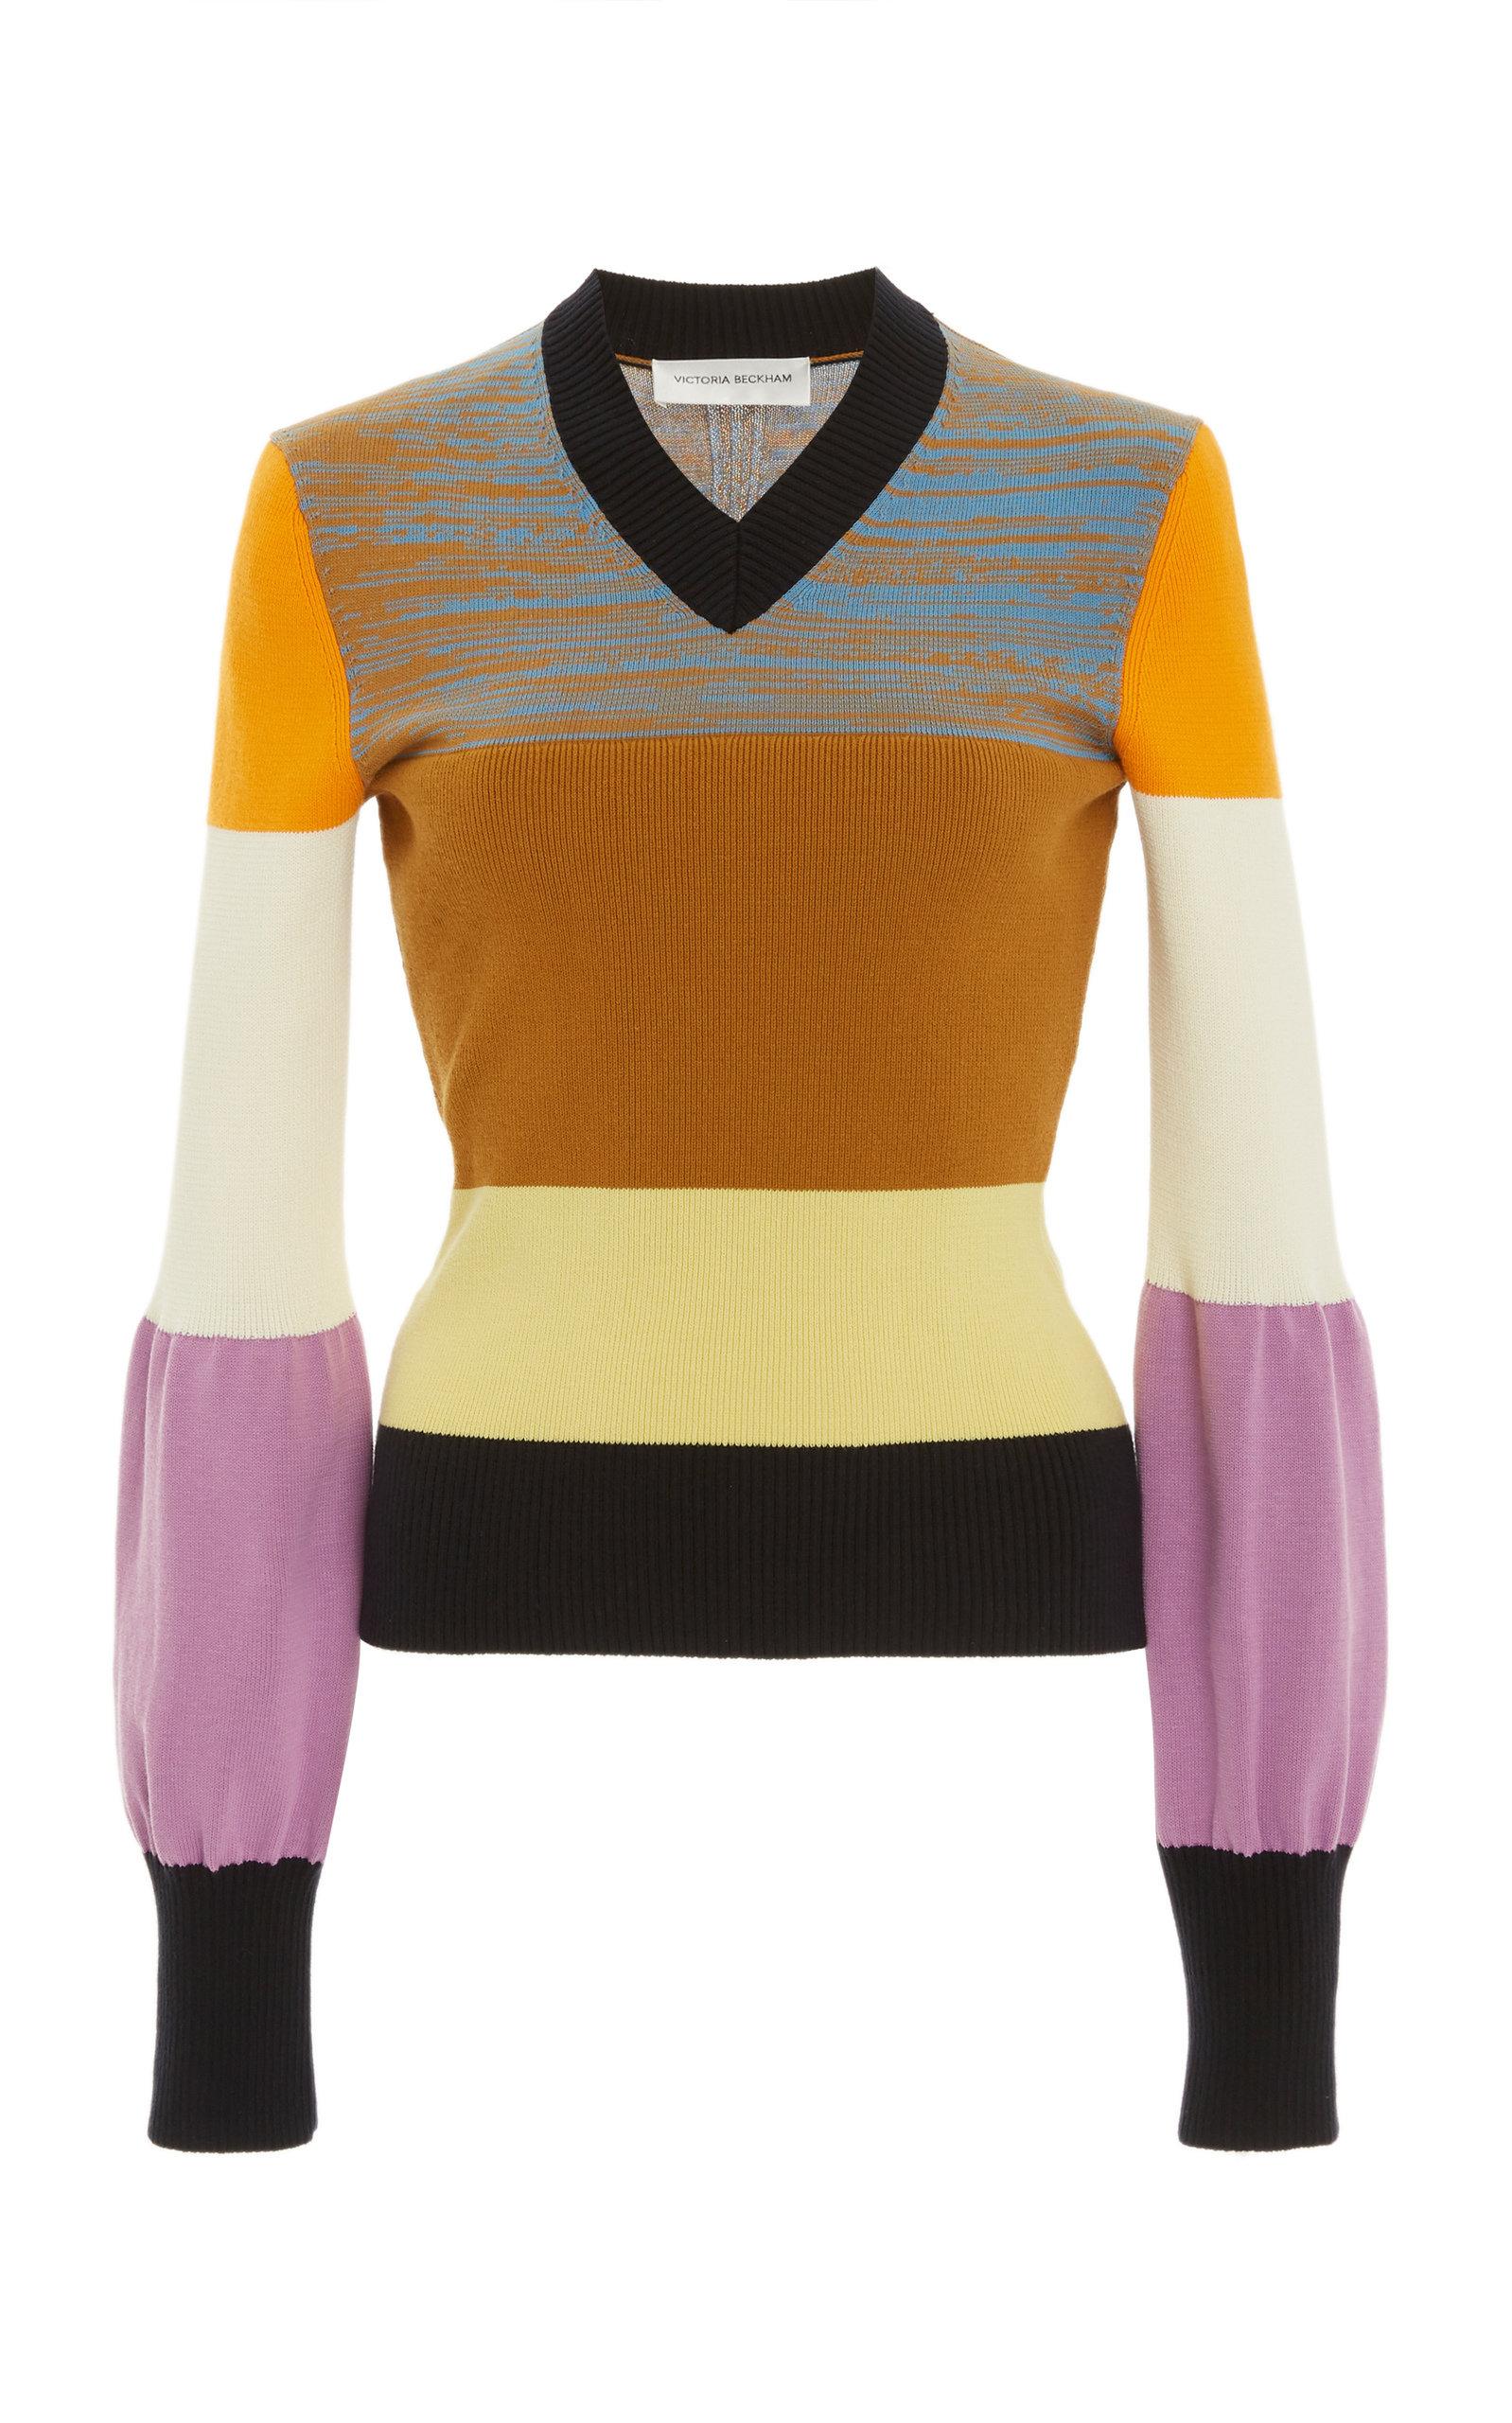 Victoria Beckham Colorblocked Cotton-blend Knit V-neck Sweater In Multi